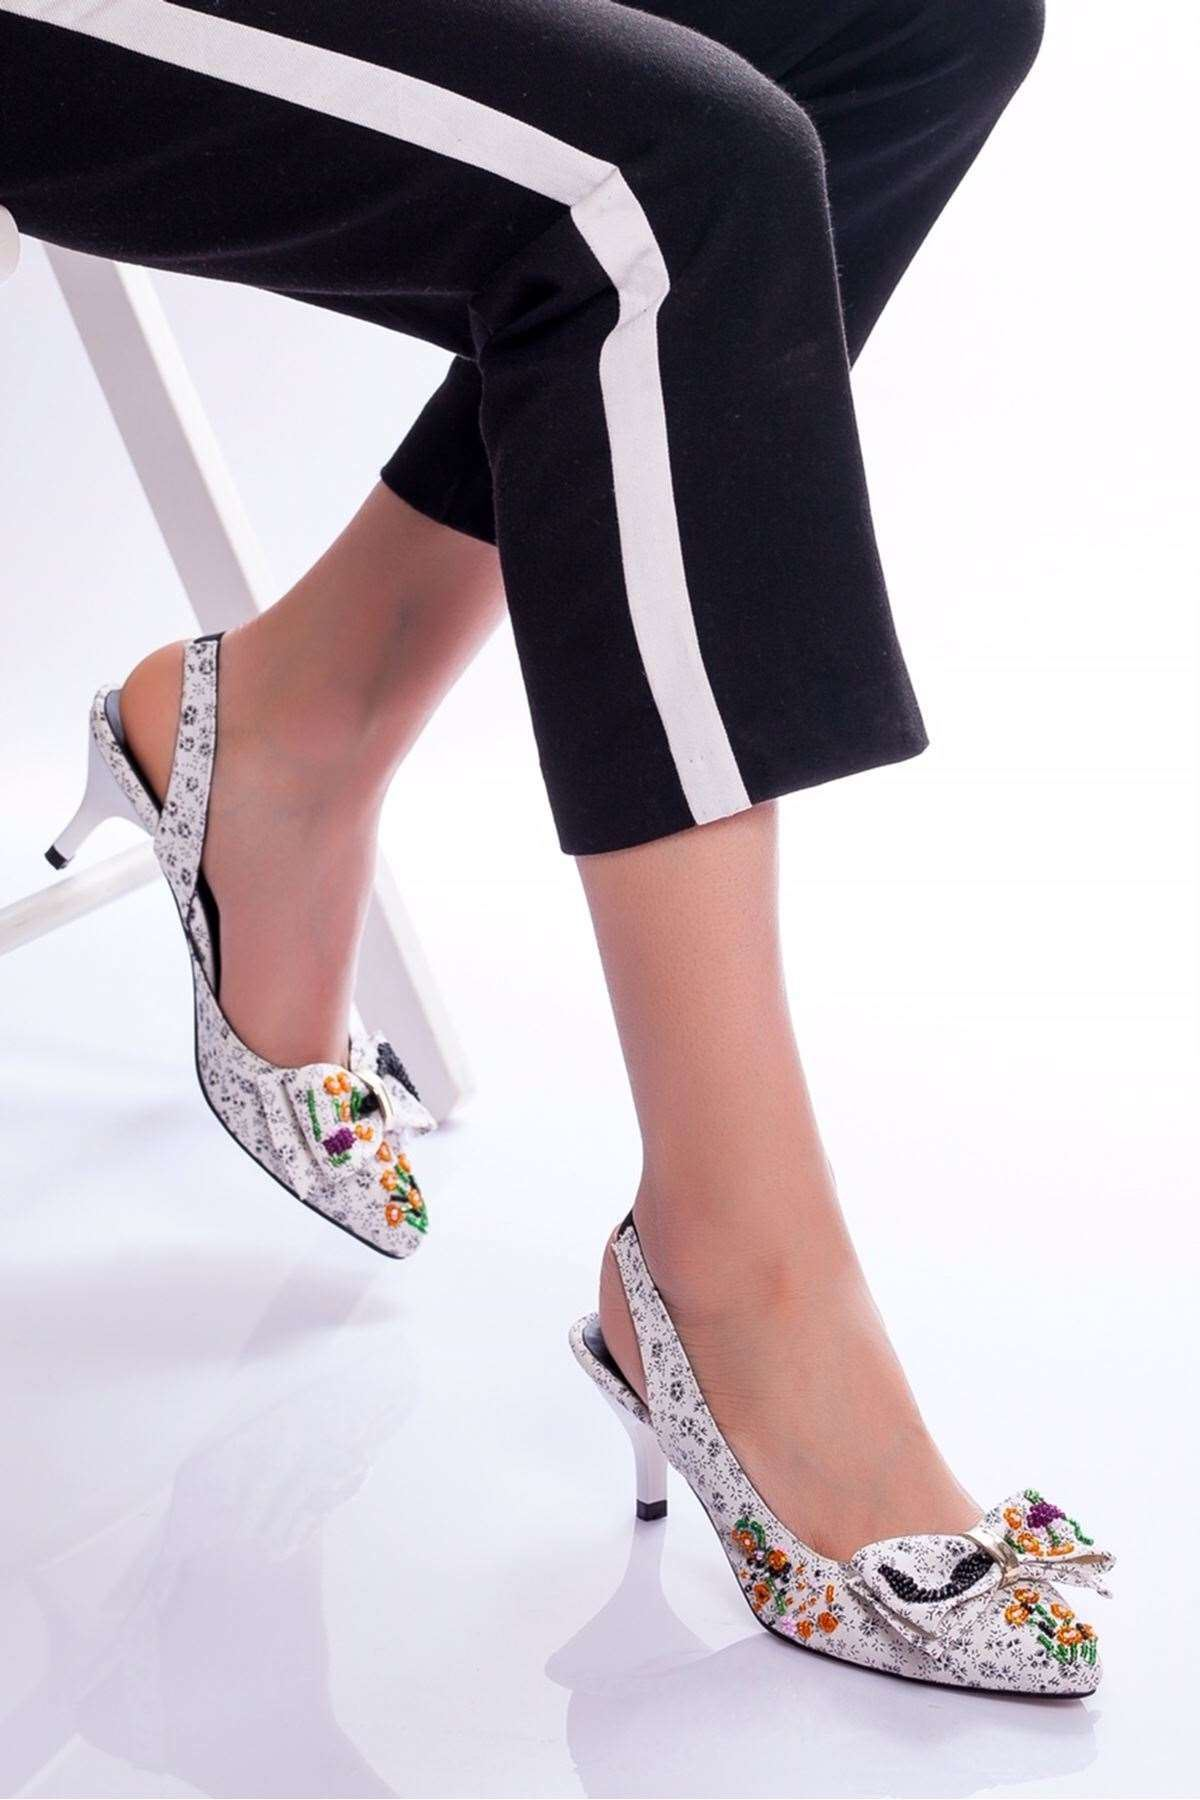 Hera Topuklu Ayakkabı BEYAZ